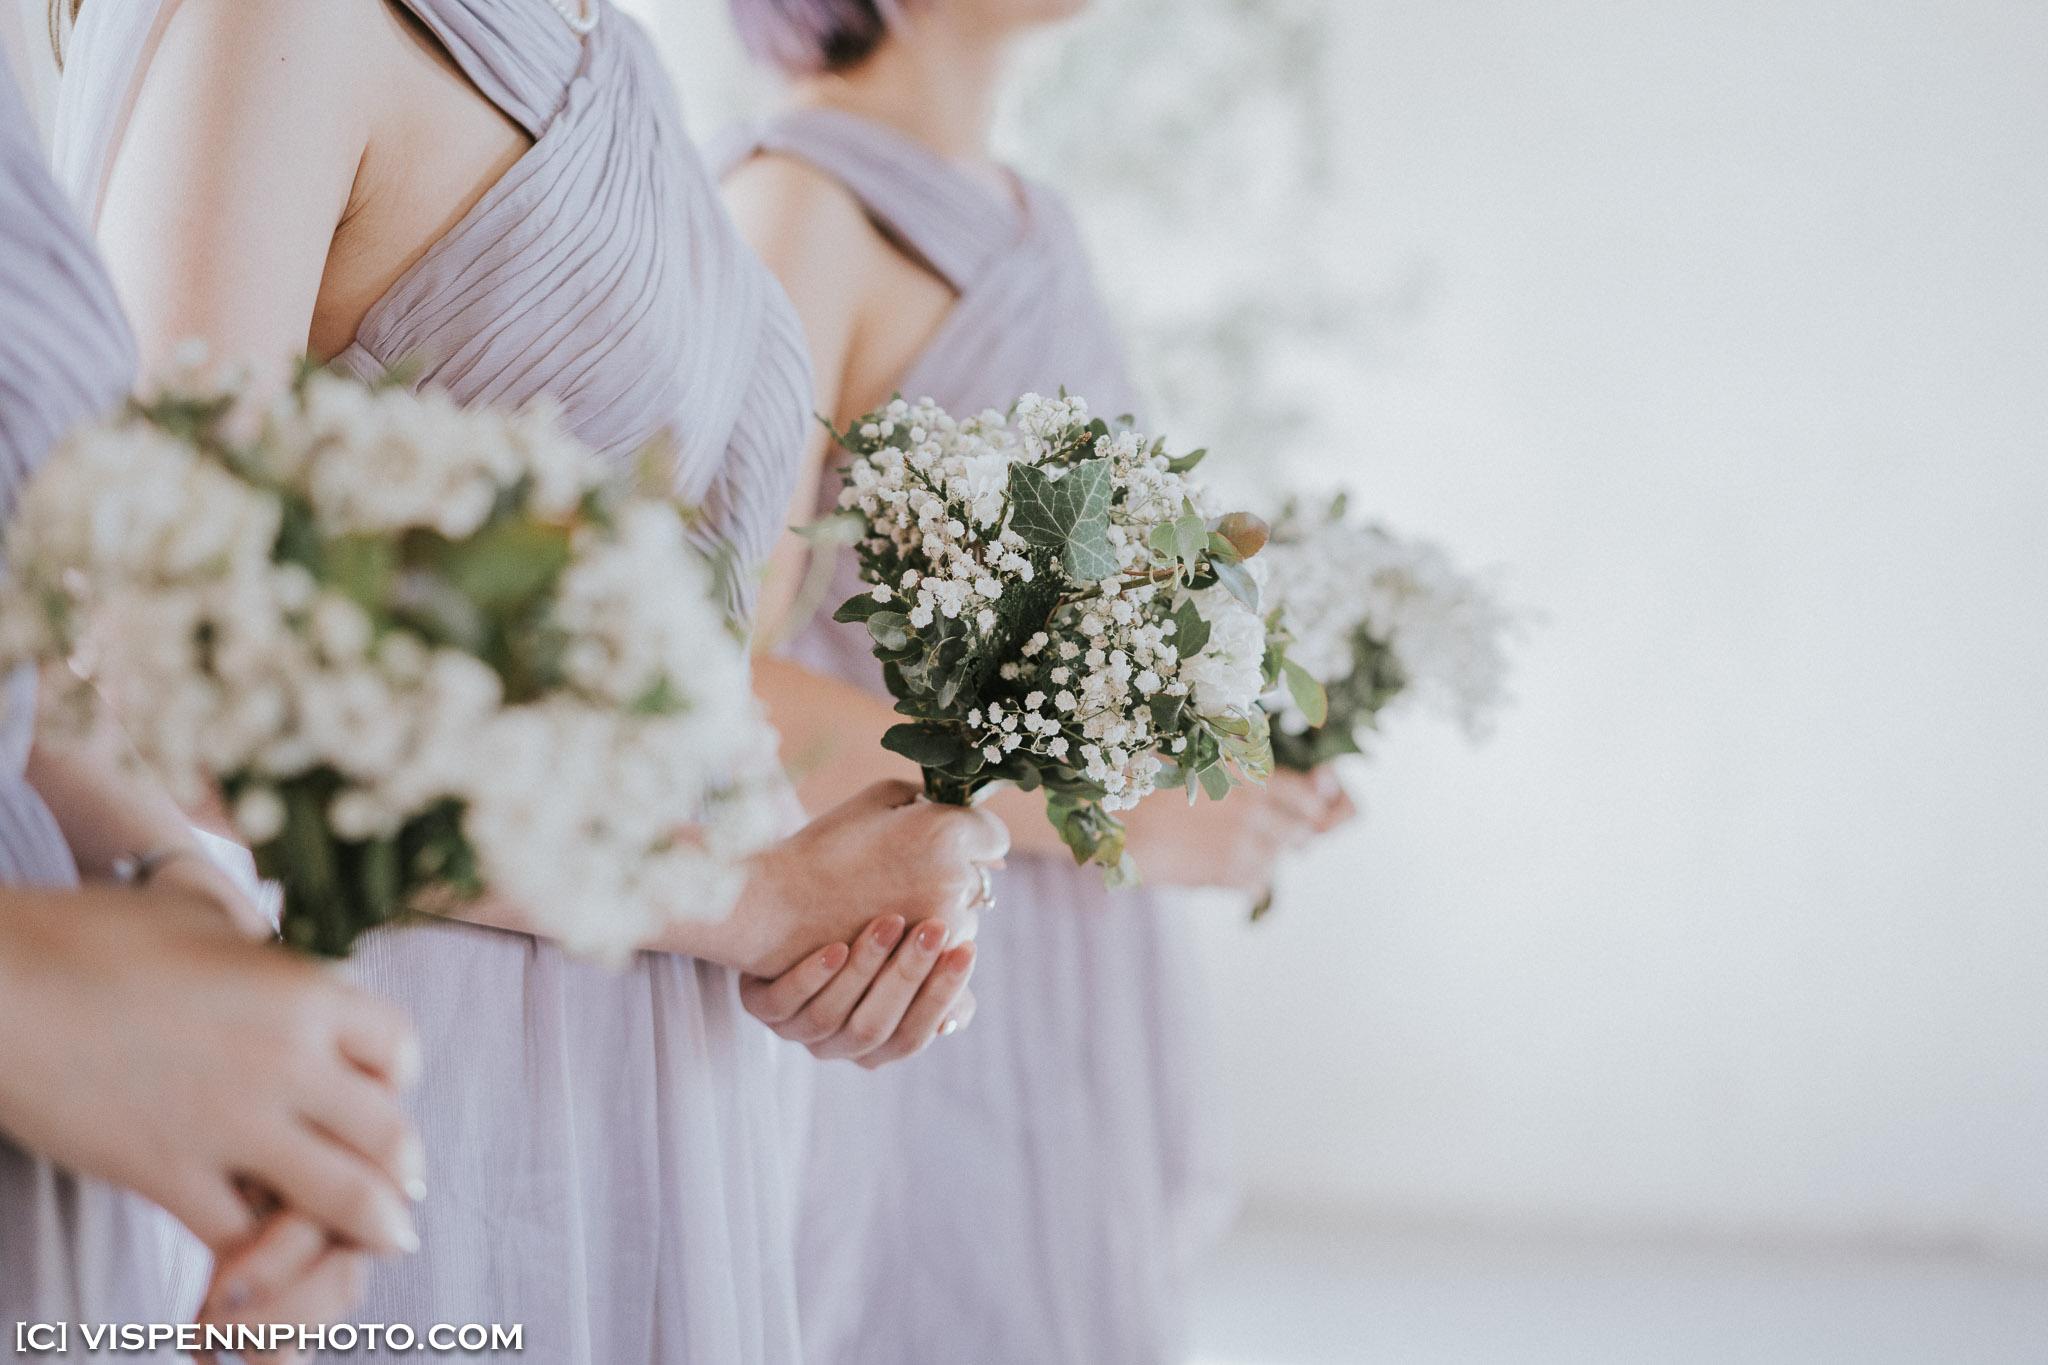 WEDDING DAY Photography Melbourne VISPENN 墨尔本 婚礼跟拍 婚礼摄像 婚礼摄影 结婚照 登记照 LeanneWesley 04607 4H A7R3 VISPENN